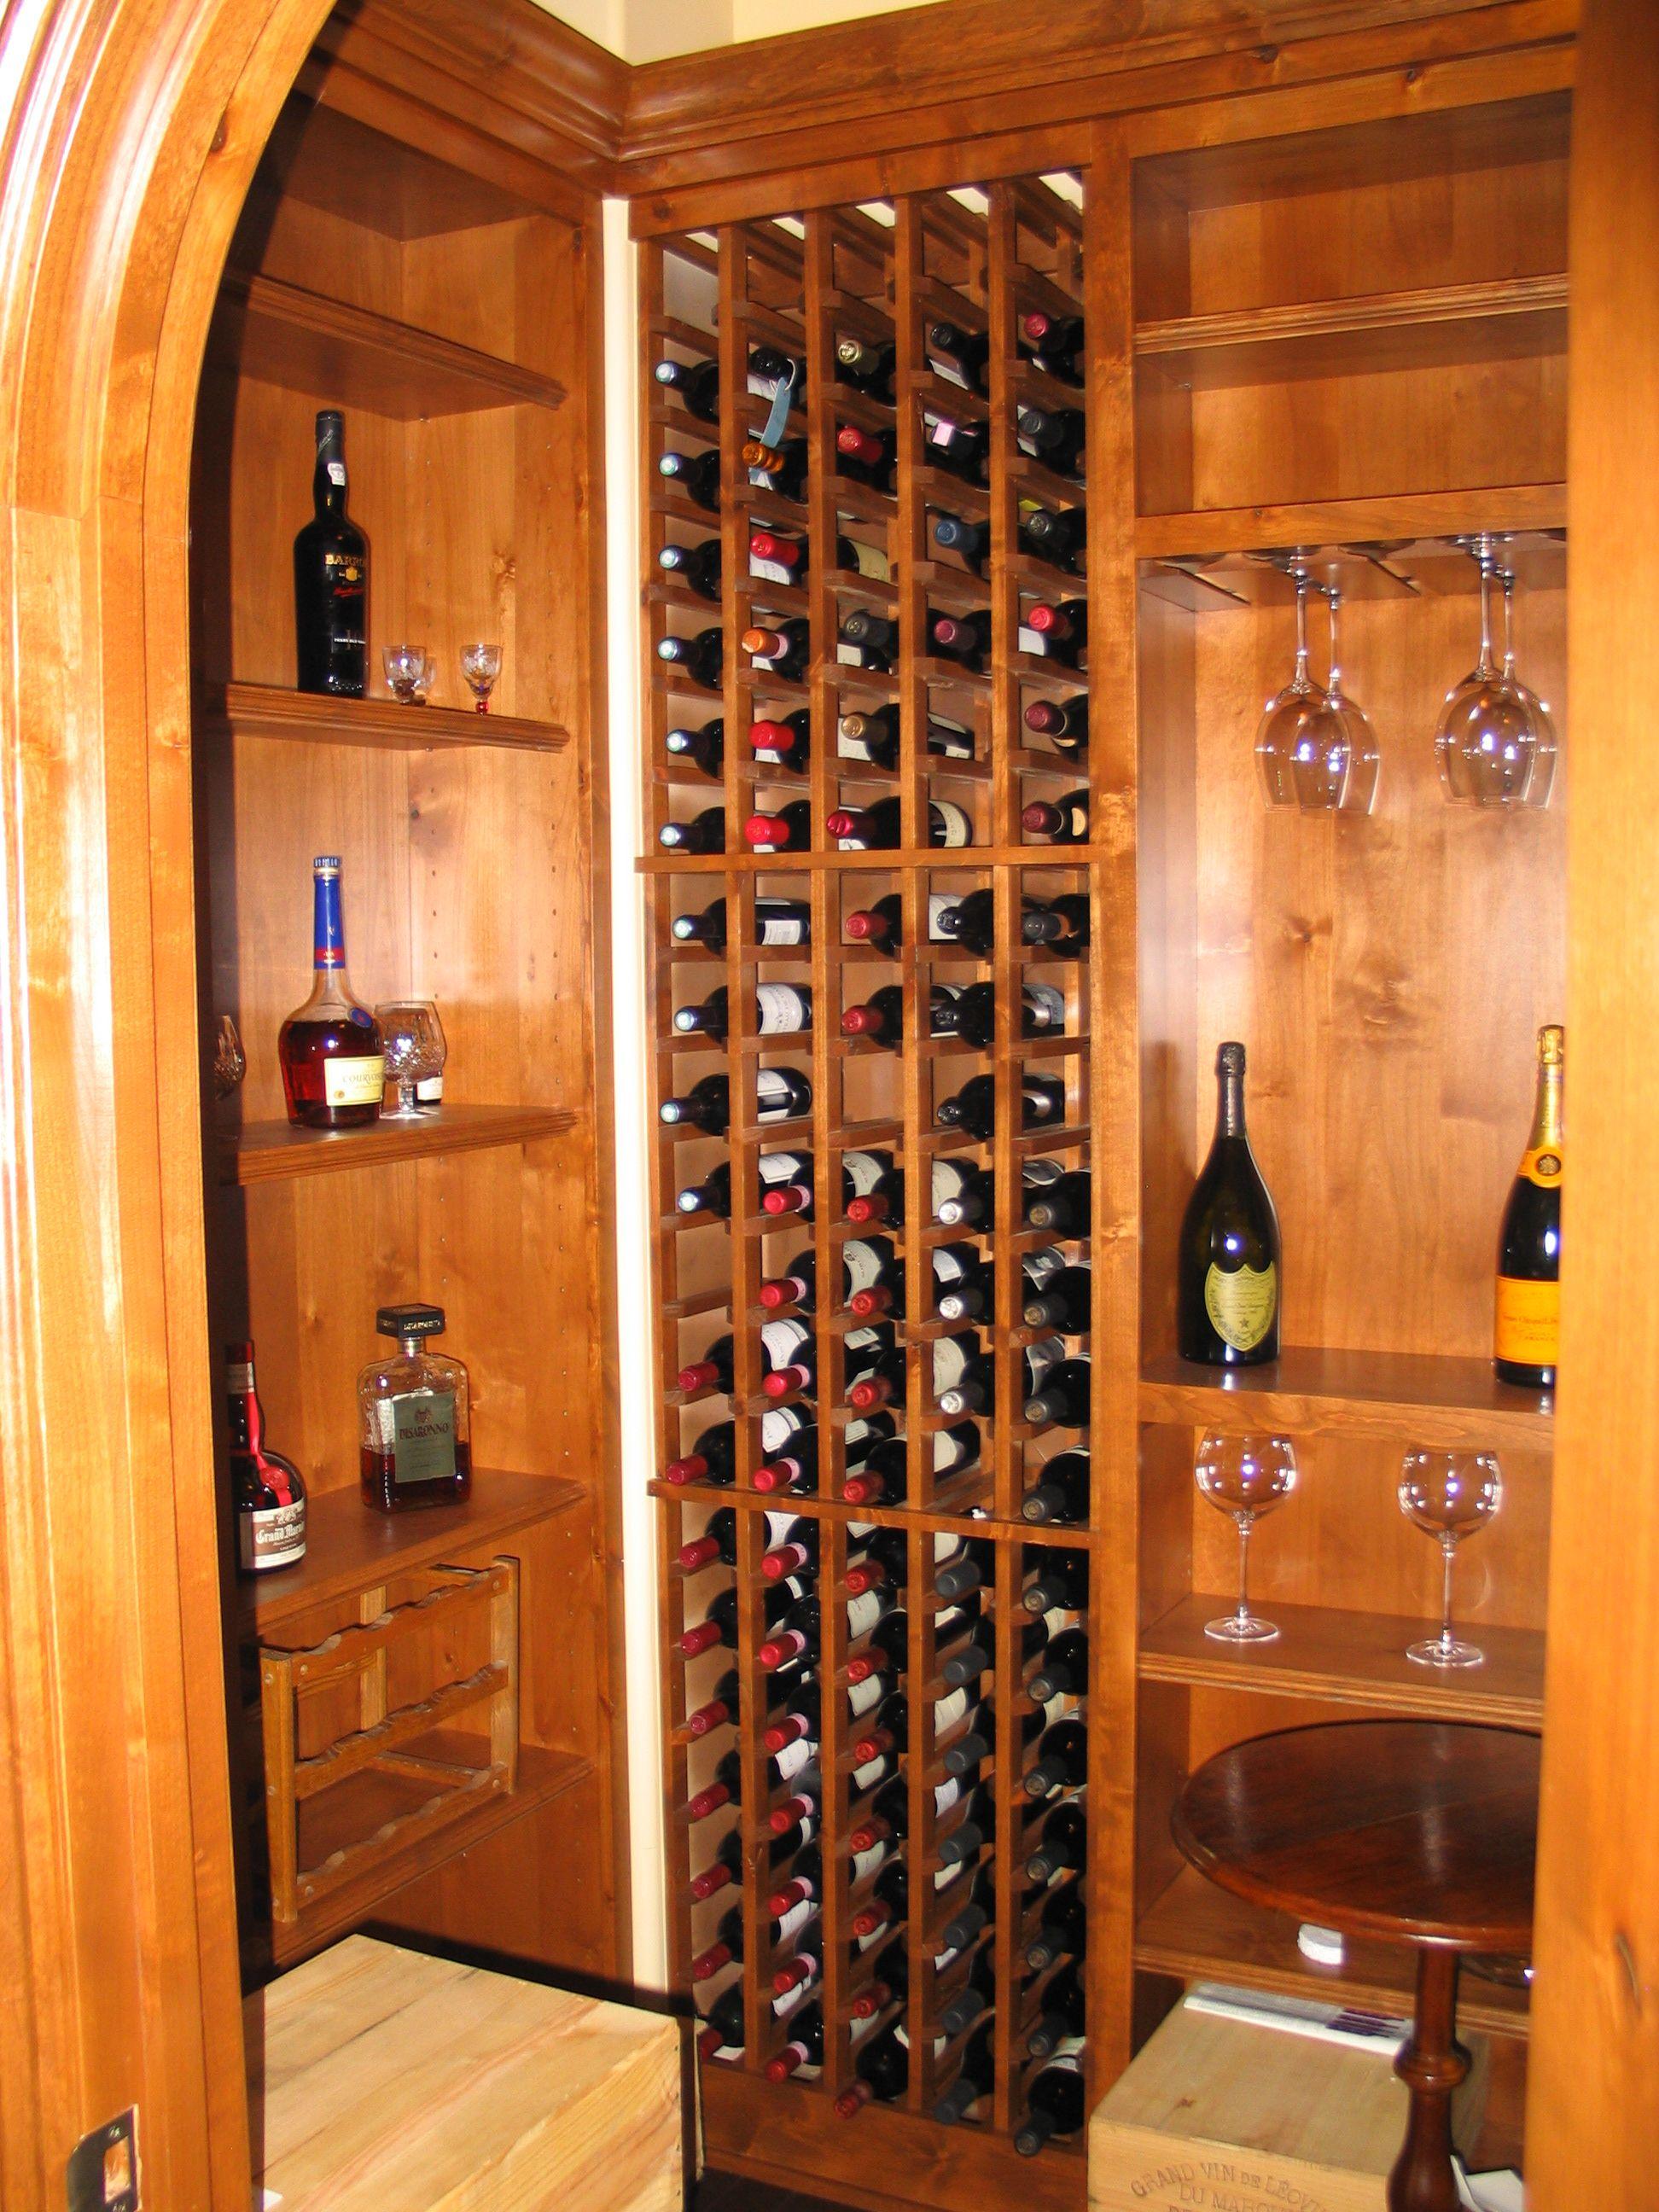 Cherry creek country club wine cellar robbiedistributorsdesigns